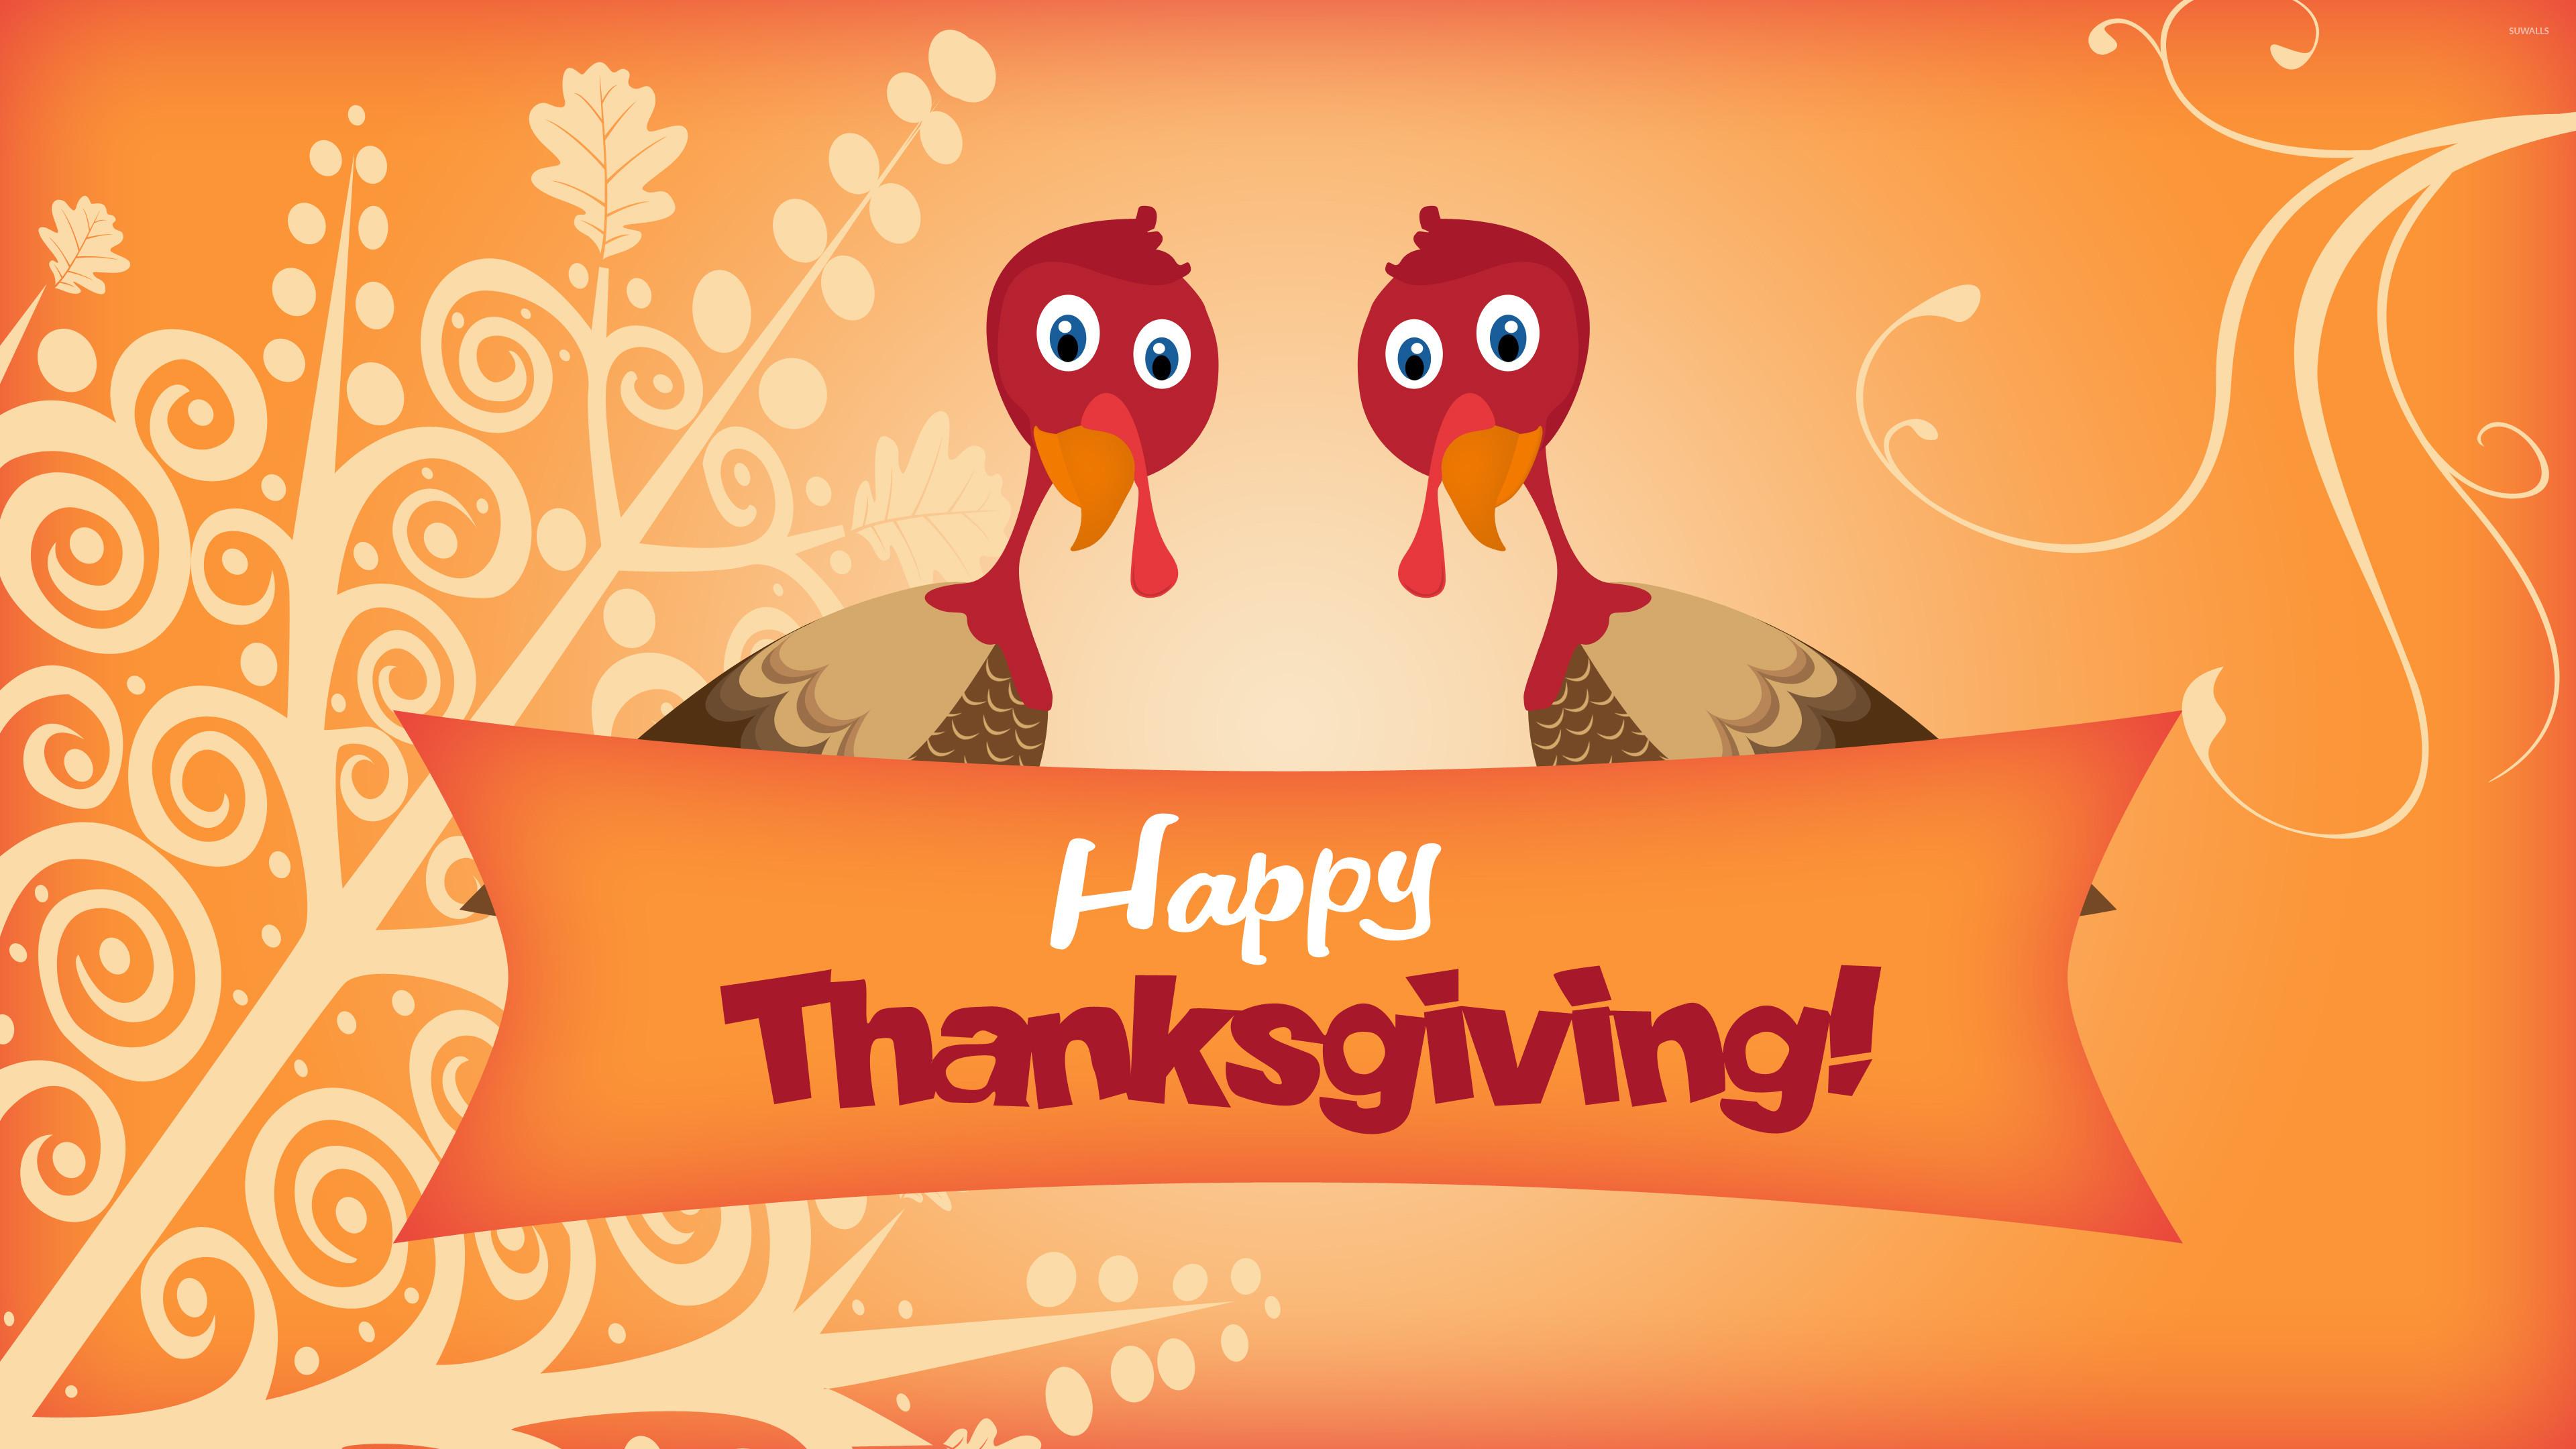 3840x2160, Two Turkeys Wishing You Happy Thanksgiving - Happy Thanksgiving - HD Wallpaper